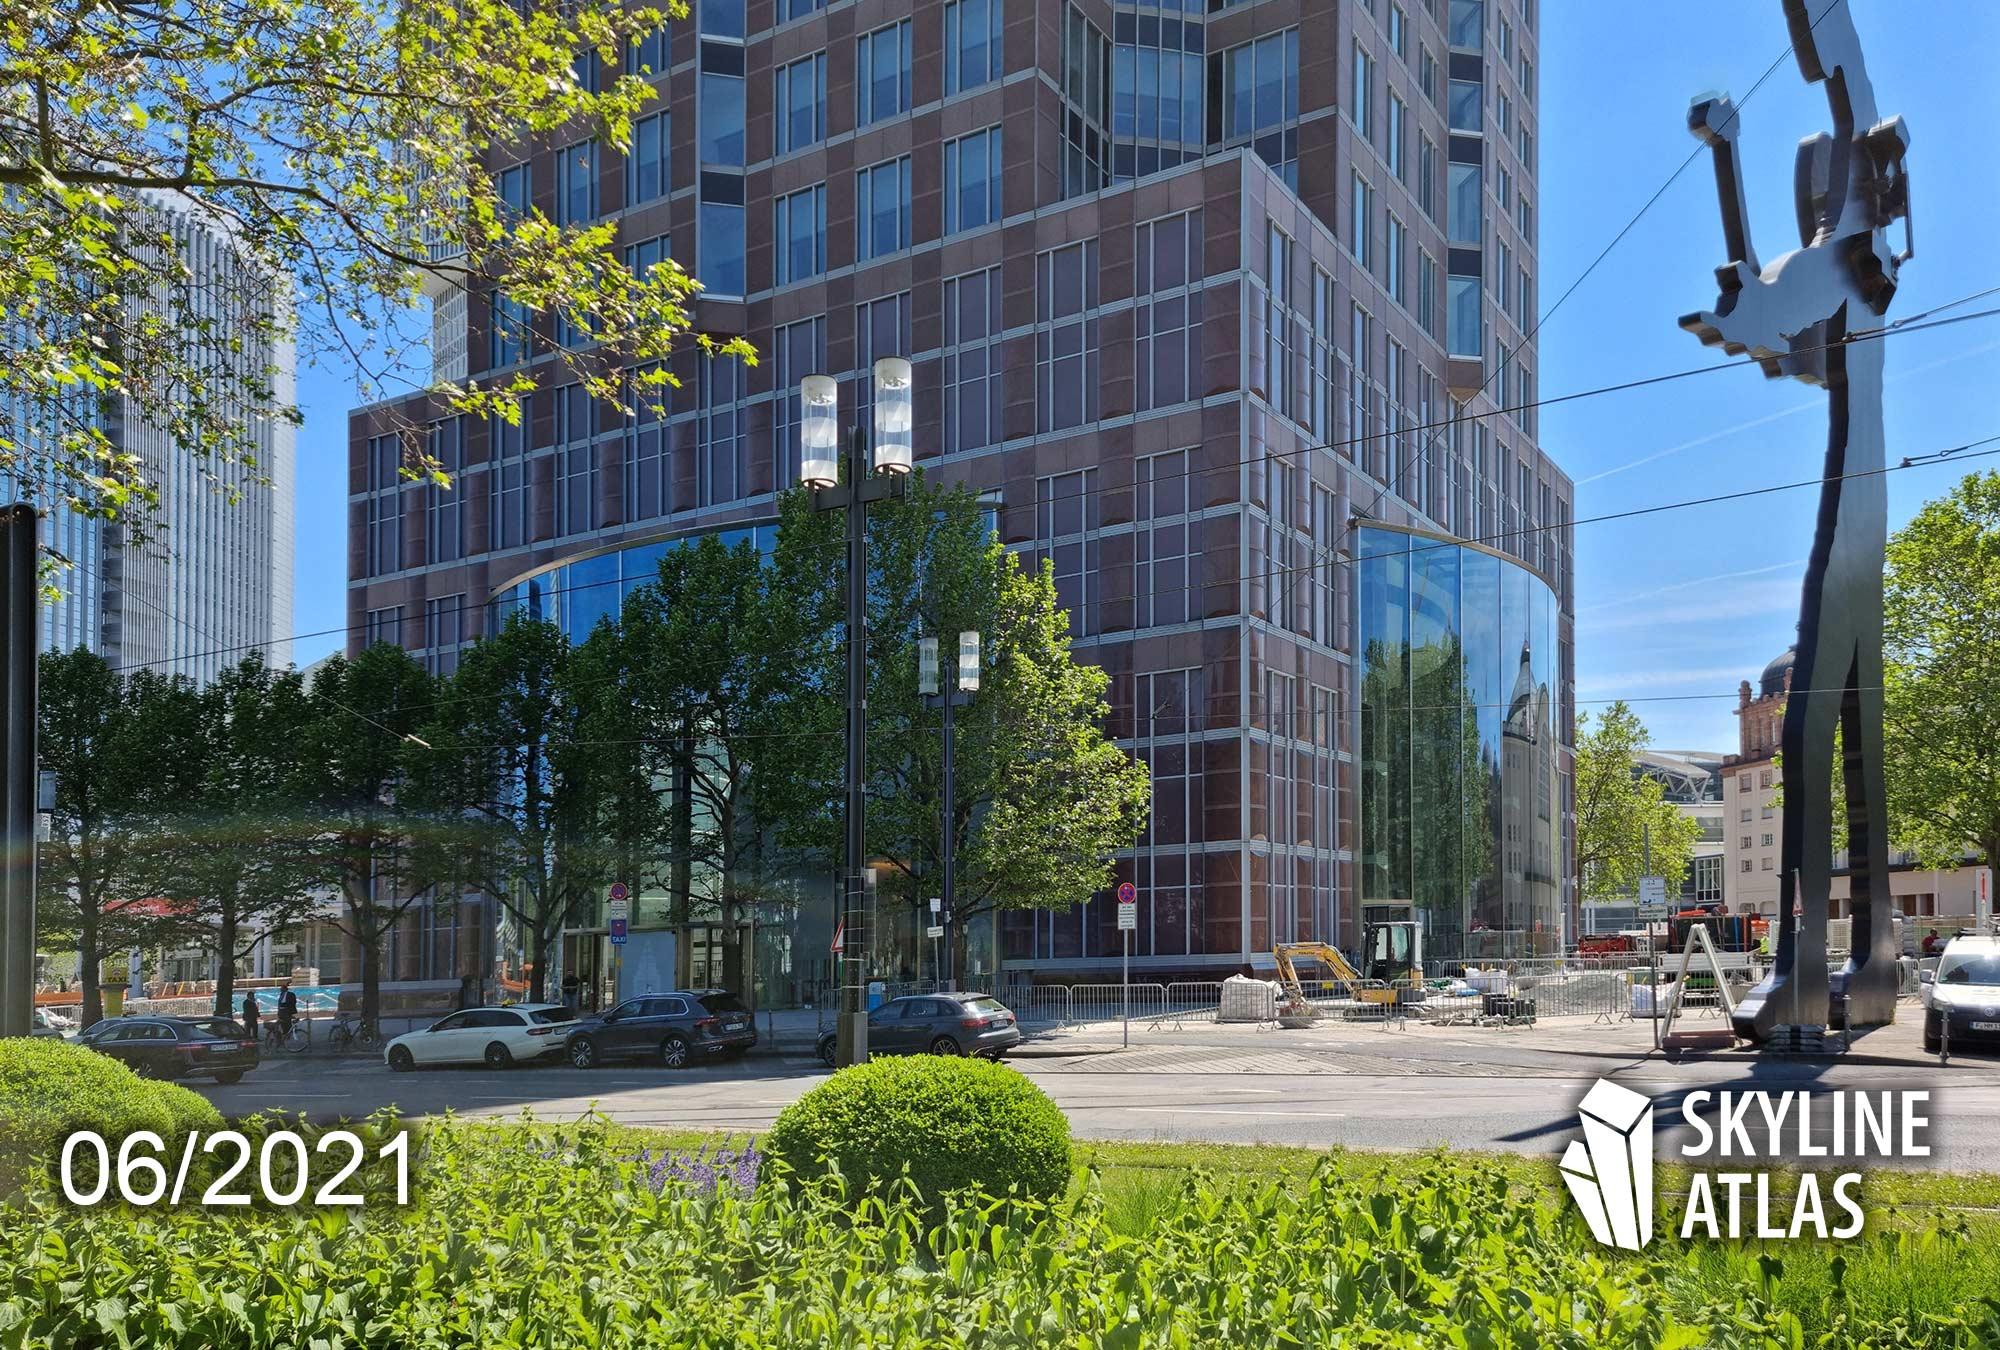 MesseTurm FFM - MesseTurm Renovierung - MesseTurm Juni 2021 - Umbau Fassade